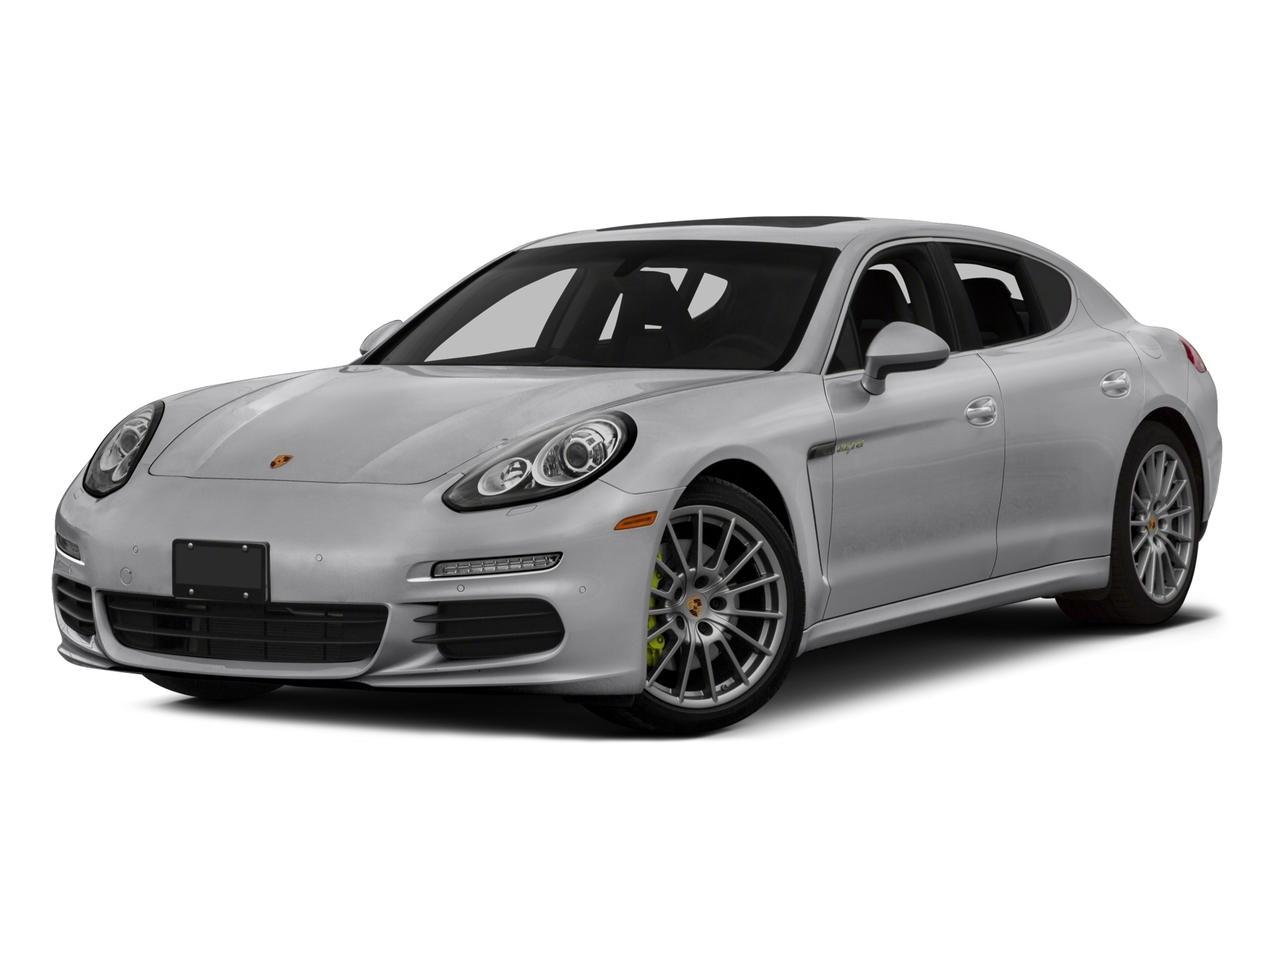 2015 Porsche Panamera Vehicle Photo in Selma, TX 78154